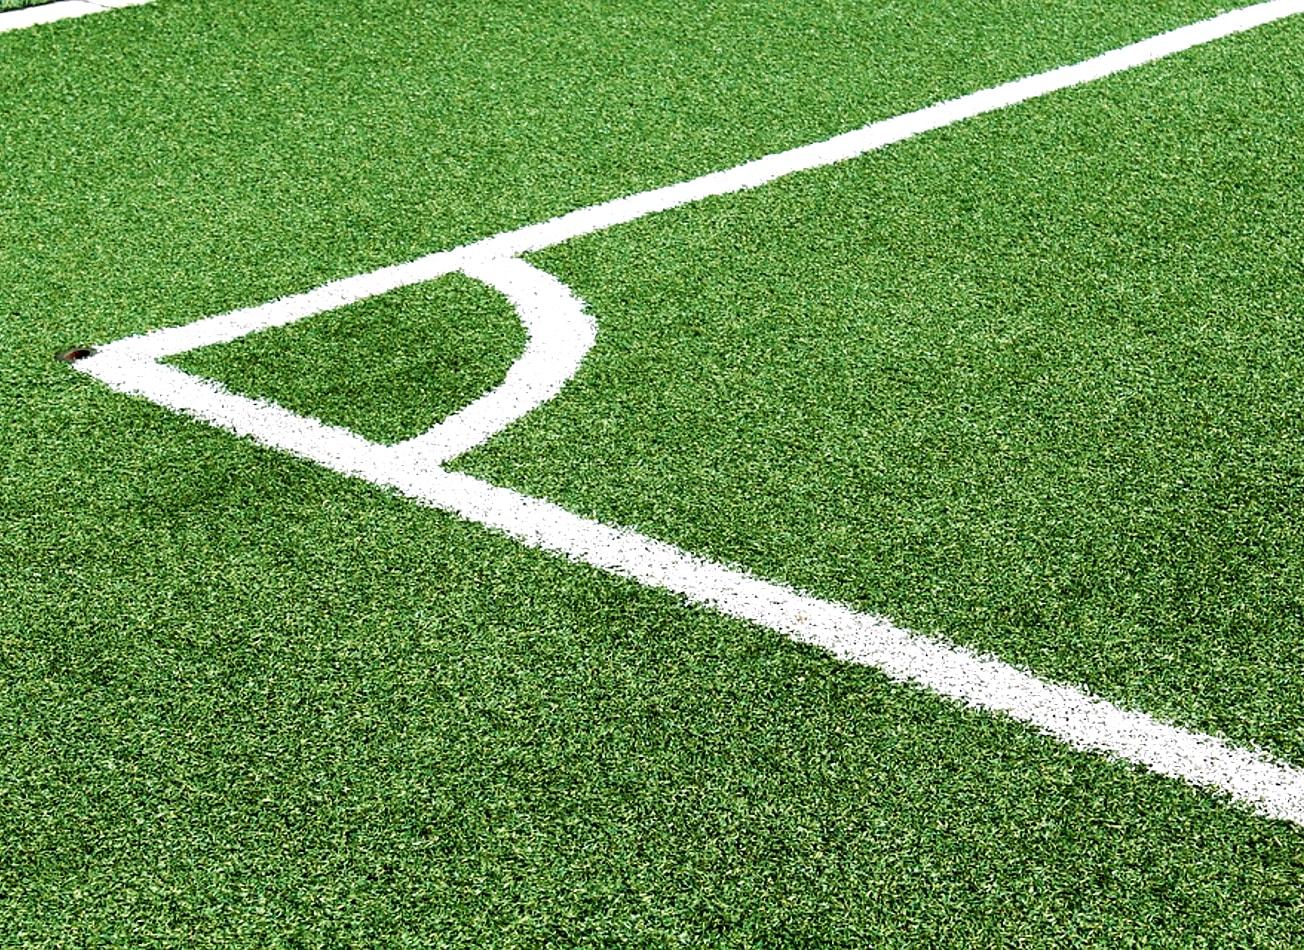 football 5 contre 5 foot five strasbourg activites vimigo